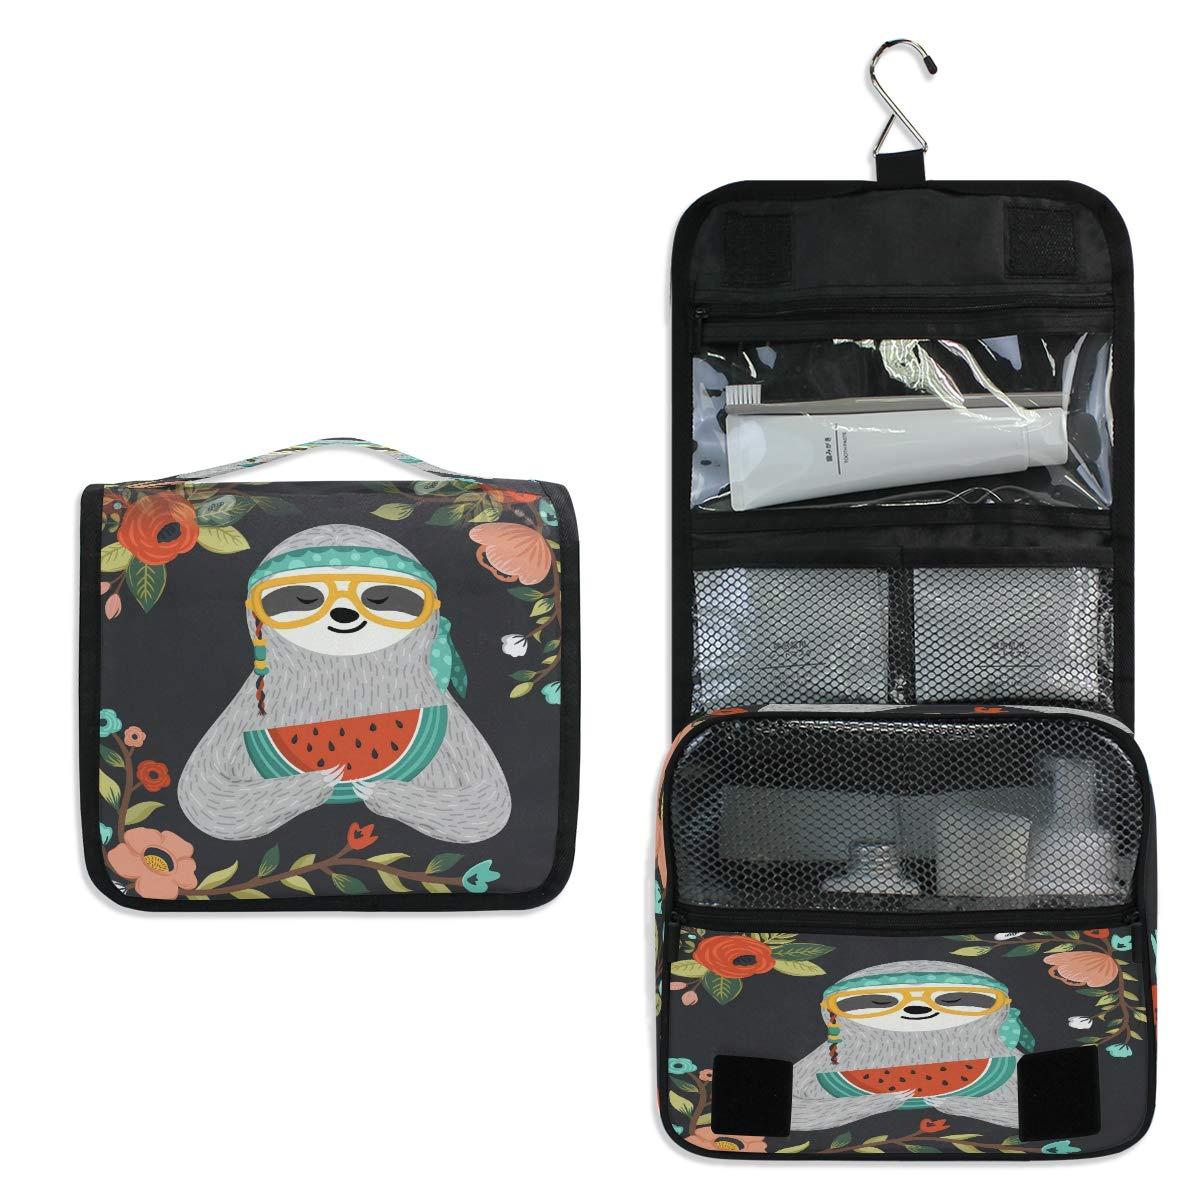 YVONAU Hanging Toiletry Bag Animal Sloth Floral Watermelon Portable Travel Cosmetic Makeup Bag Bathroom Shower Shaving Kit Organizer Bag for Men Women